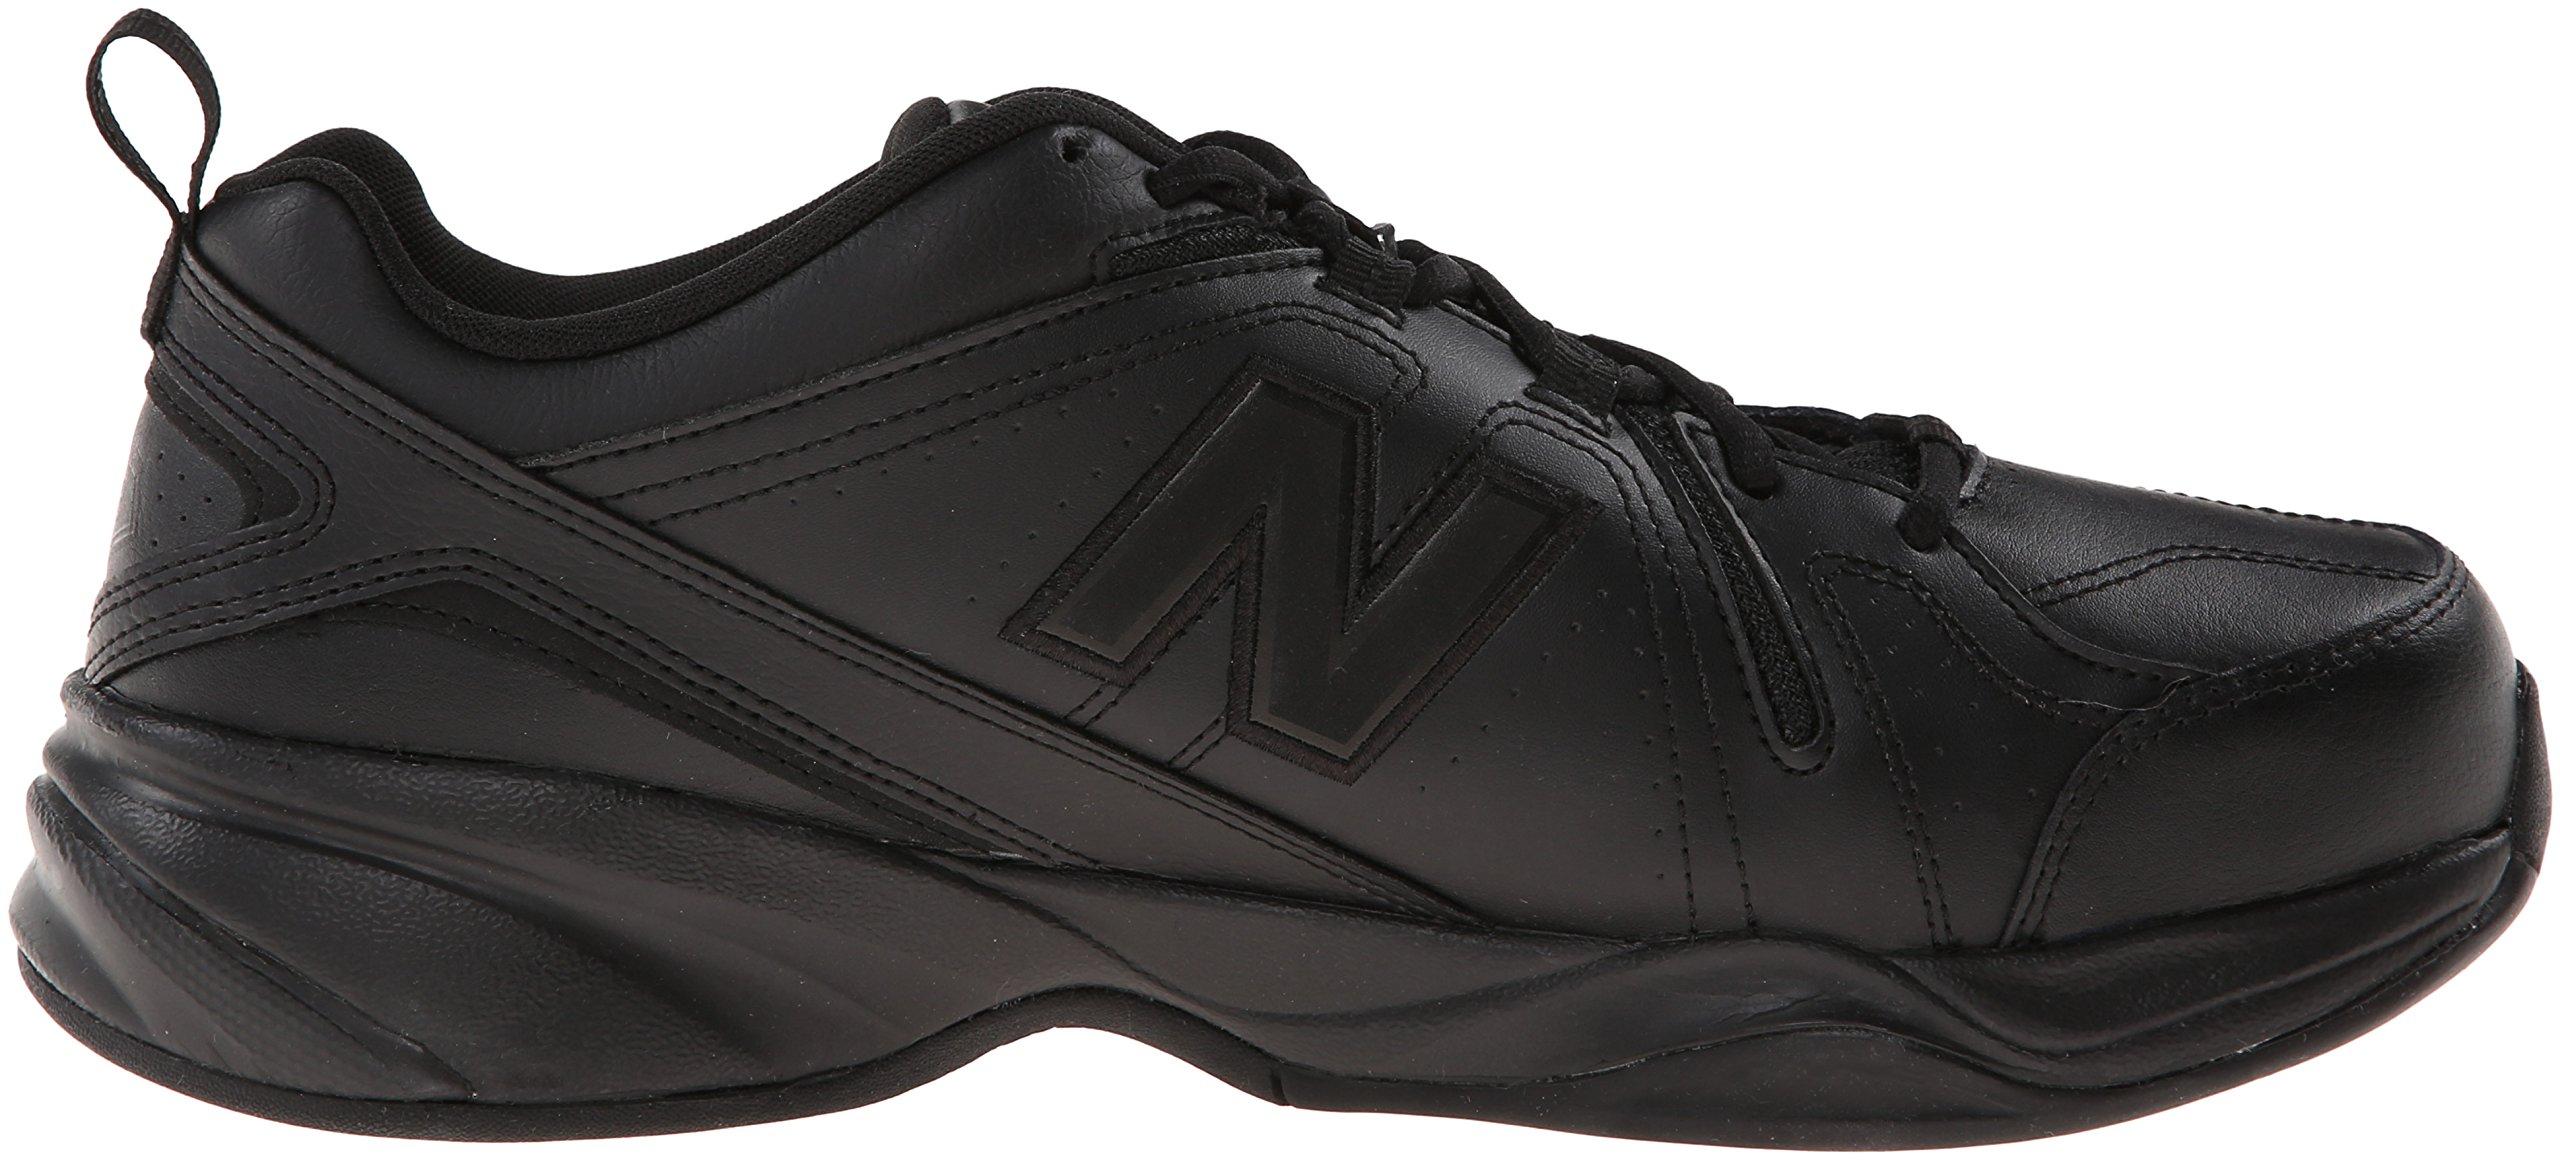 New Balance Men's MX608v4 Training Shoe, Black, 6.5 D US by New Balance (Image #7)